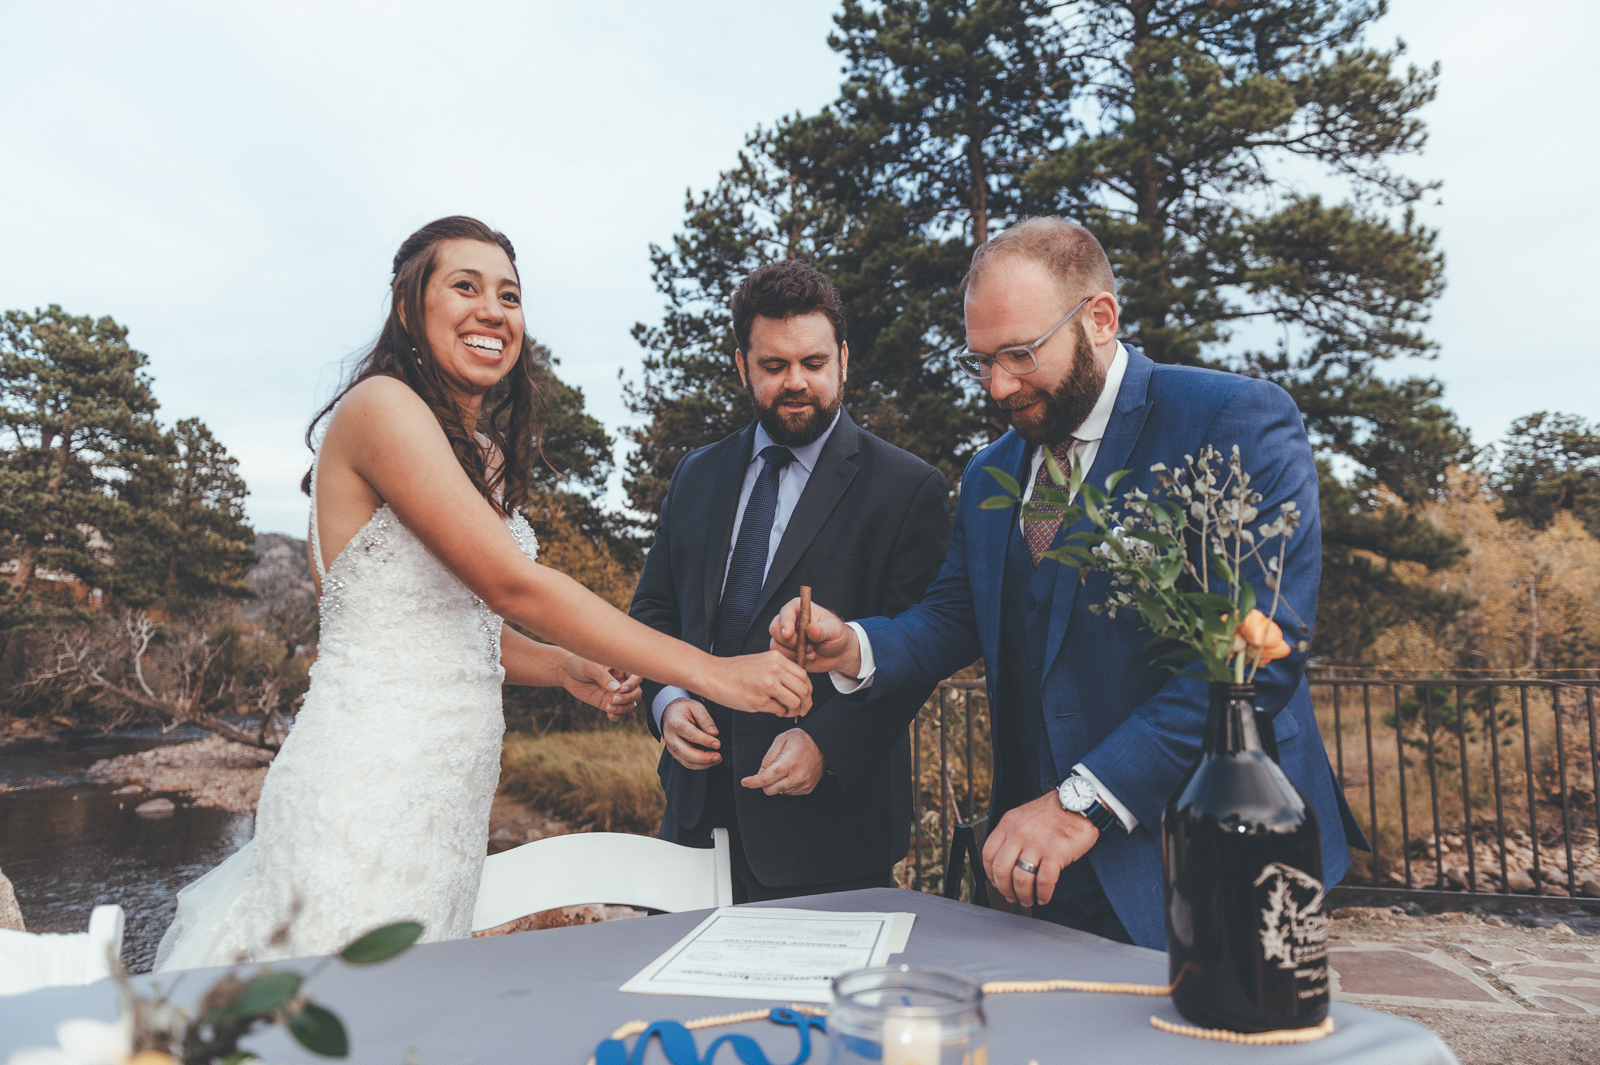 ChadFahnestockPhotography-estes-park-wedding-photography-050.jpg